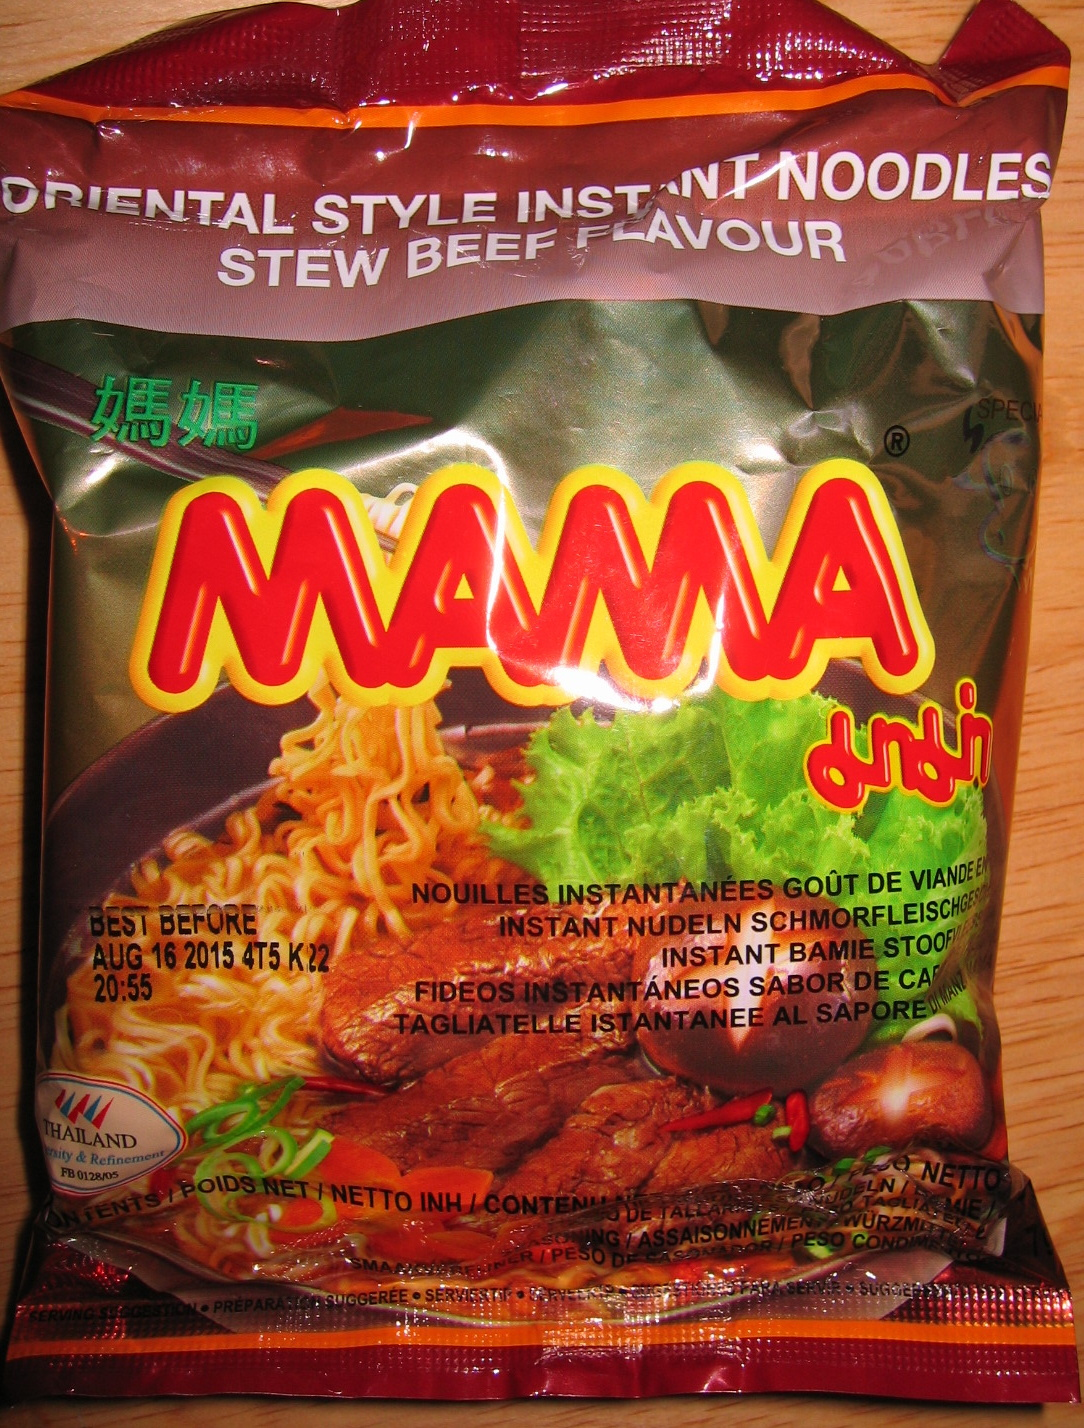 Oriental style instant noodles stew beef flavour - Product - en